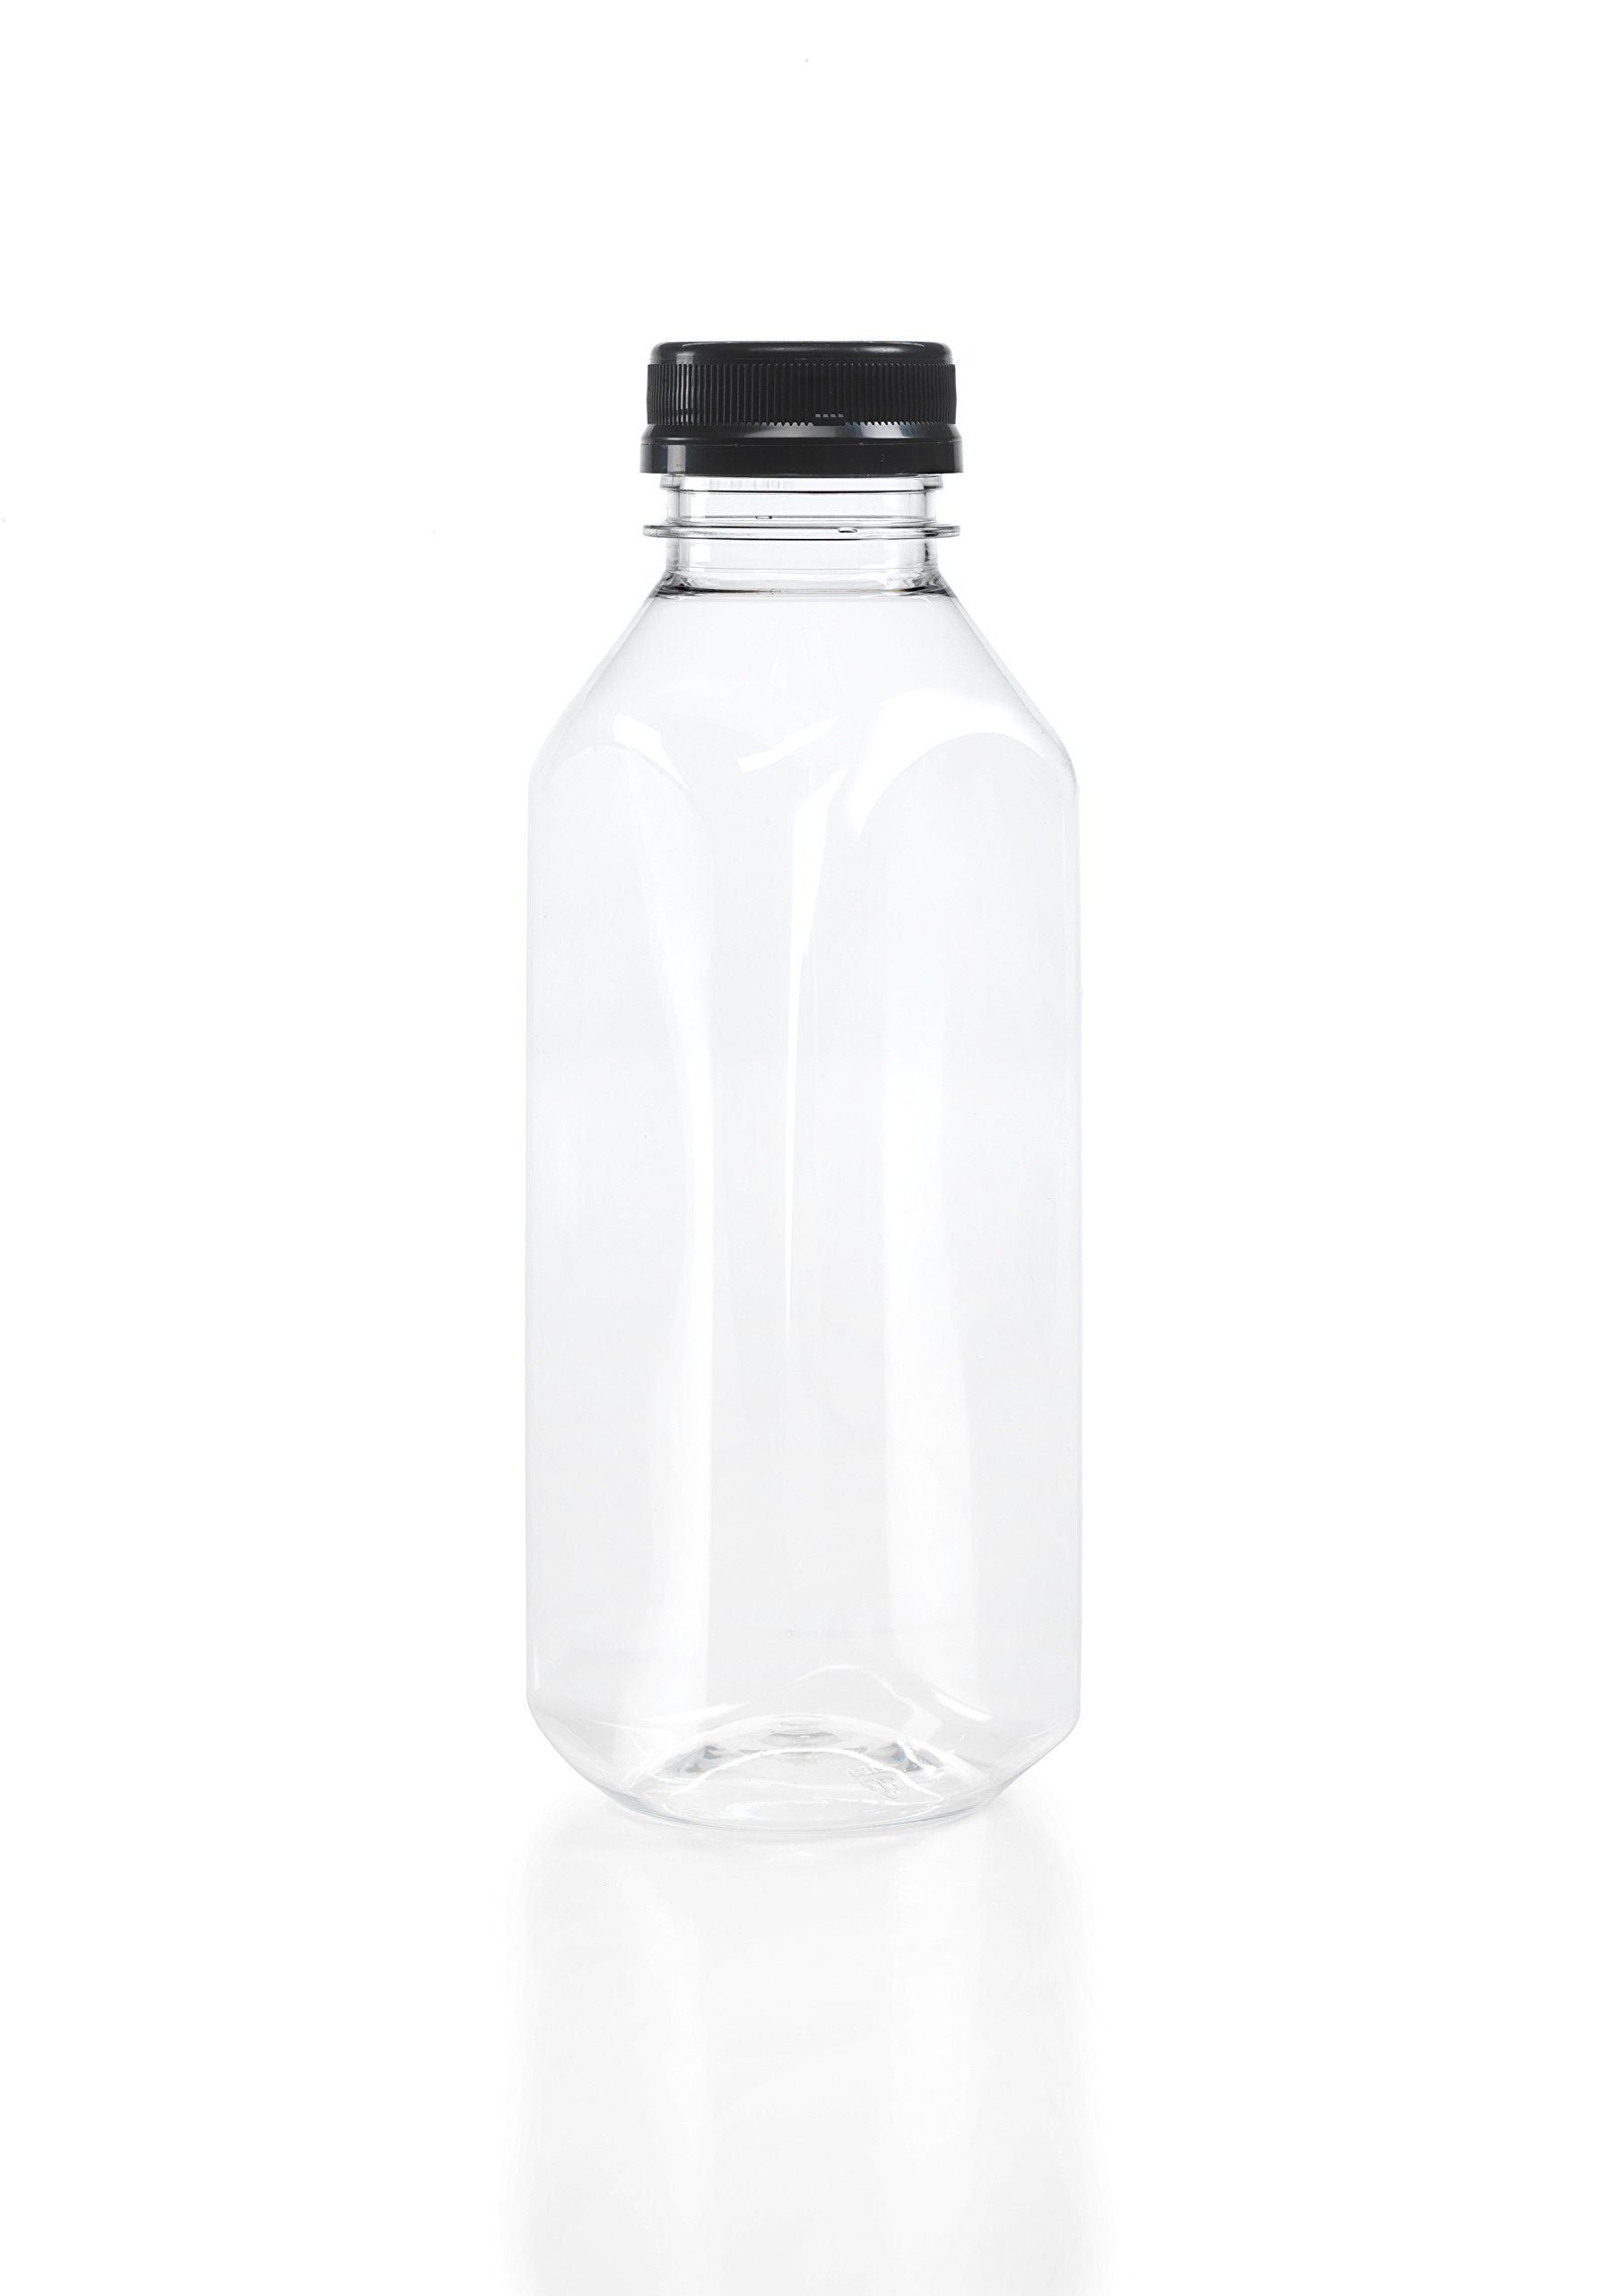 (28) 16 oz. Clear Food Grade Plastic Juice Bottles with Black Cap (28/Bottles)